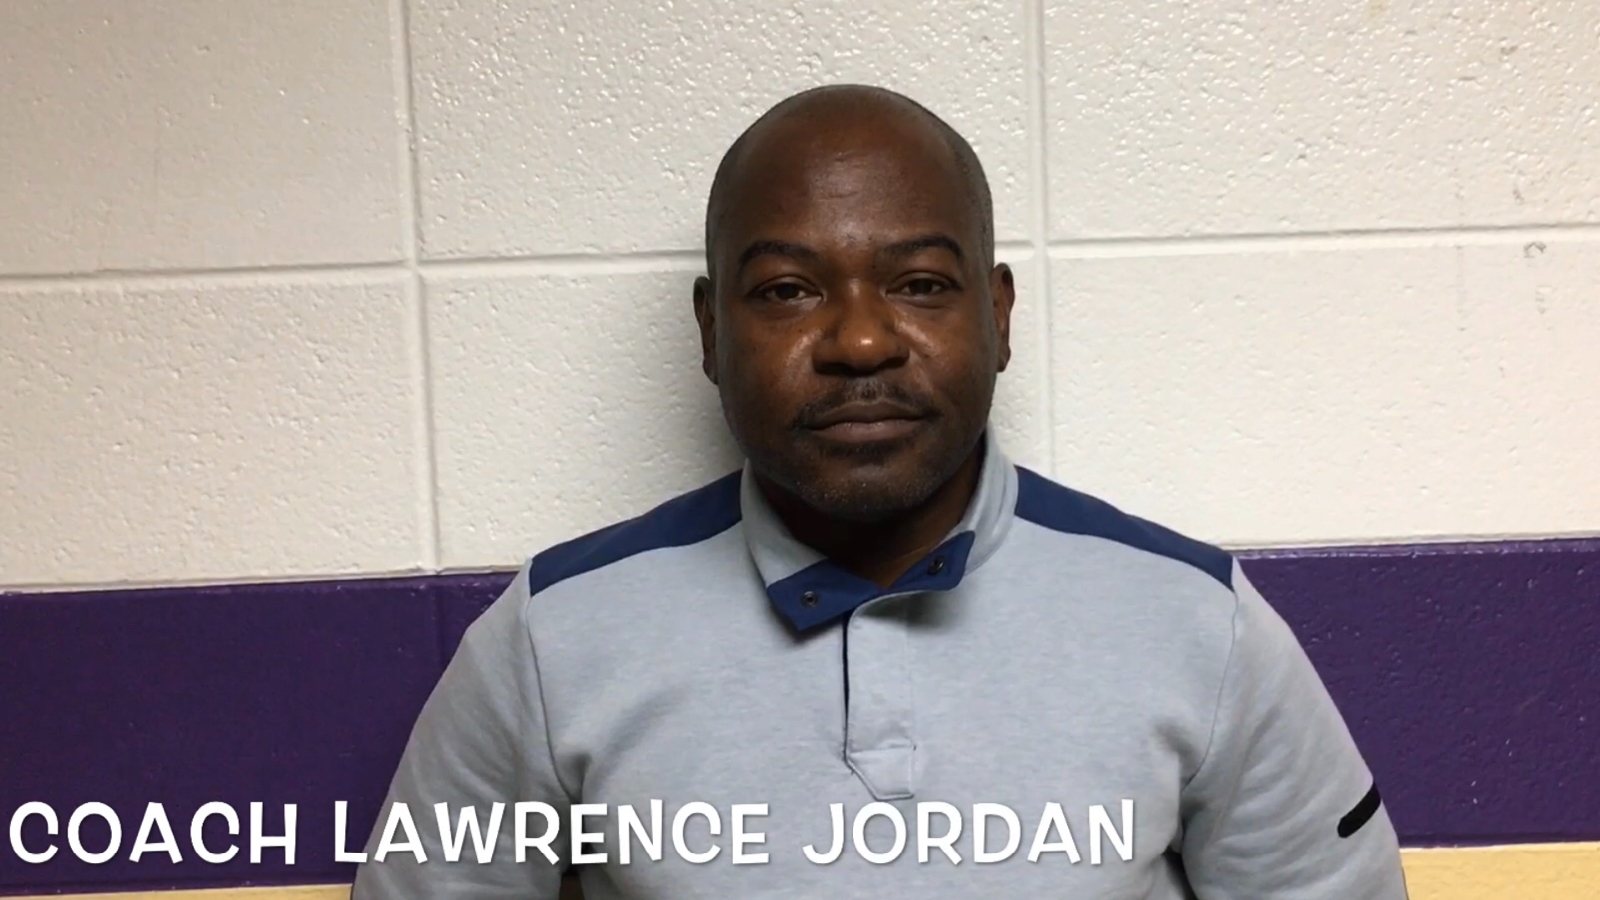 Congratulations to Coach Lawrence Jordan